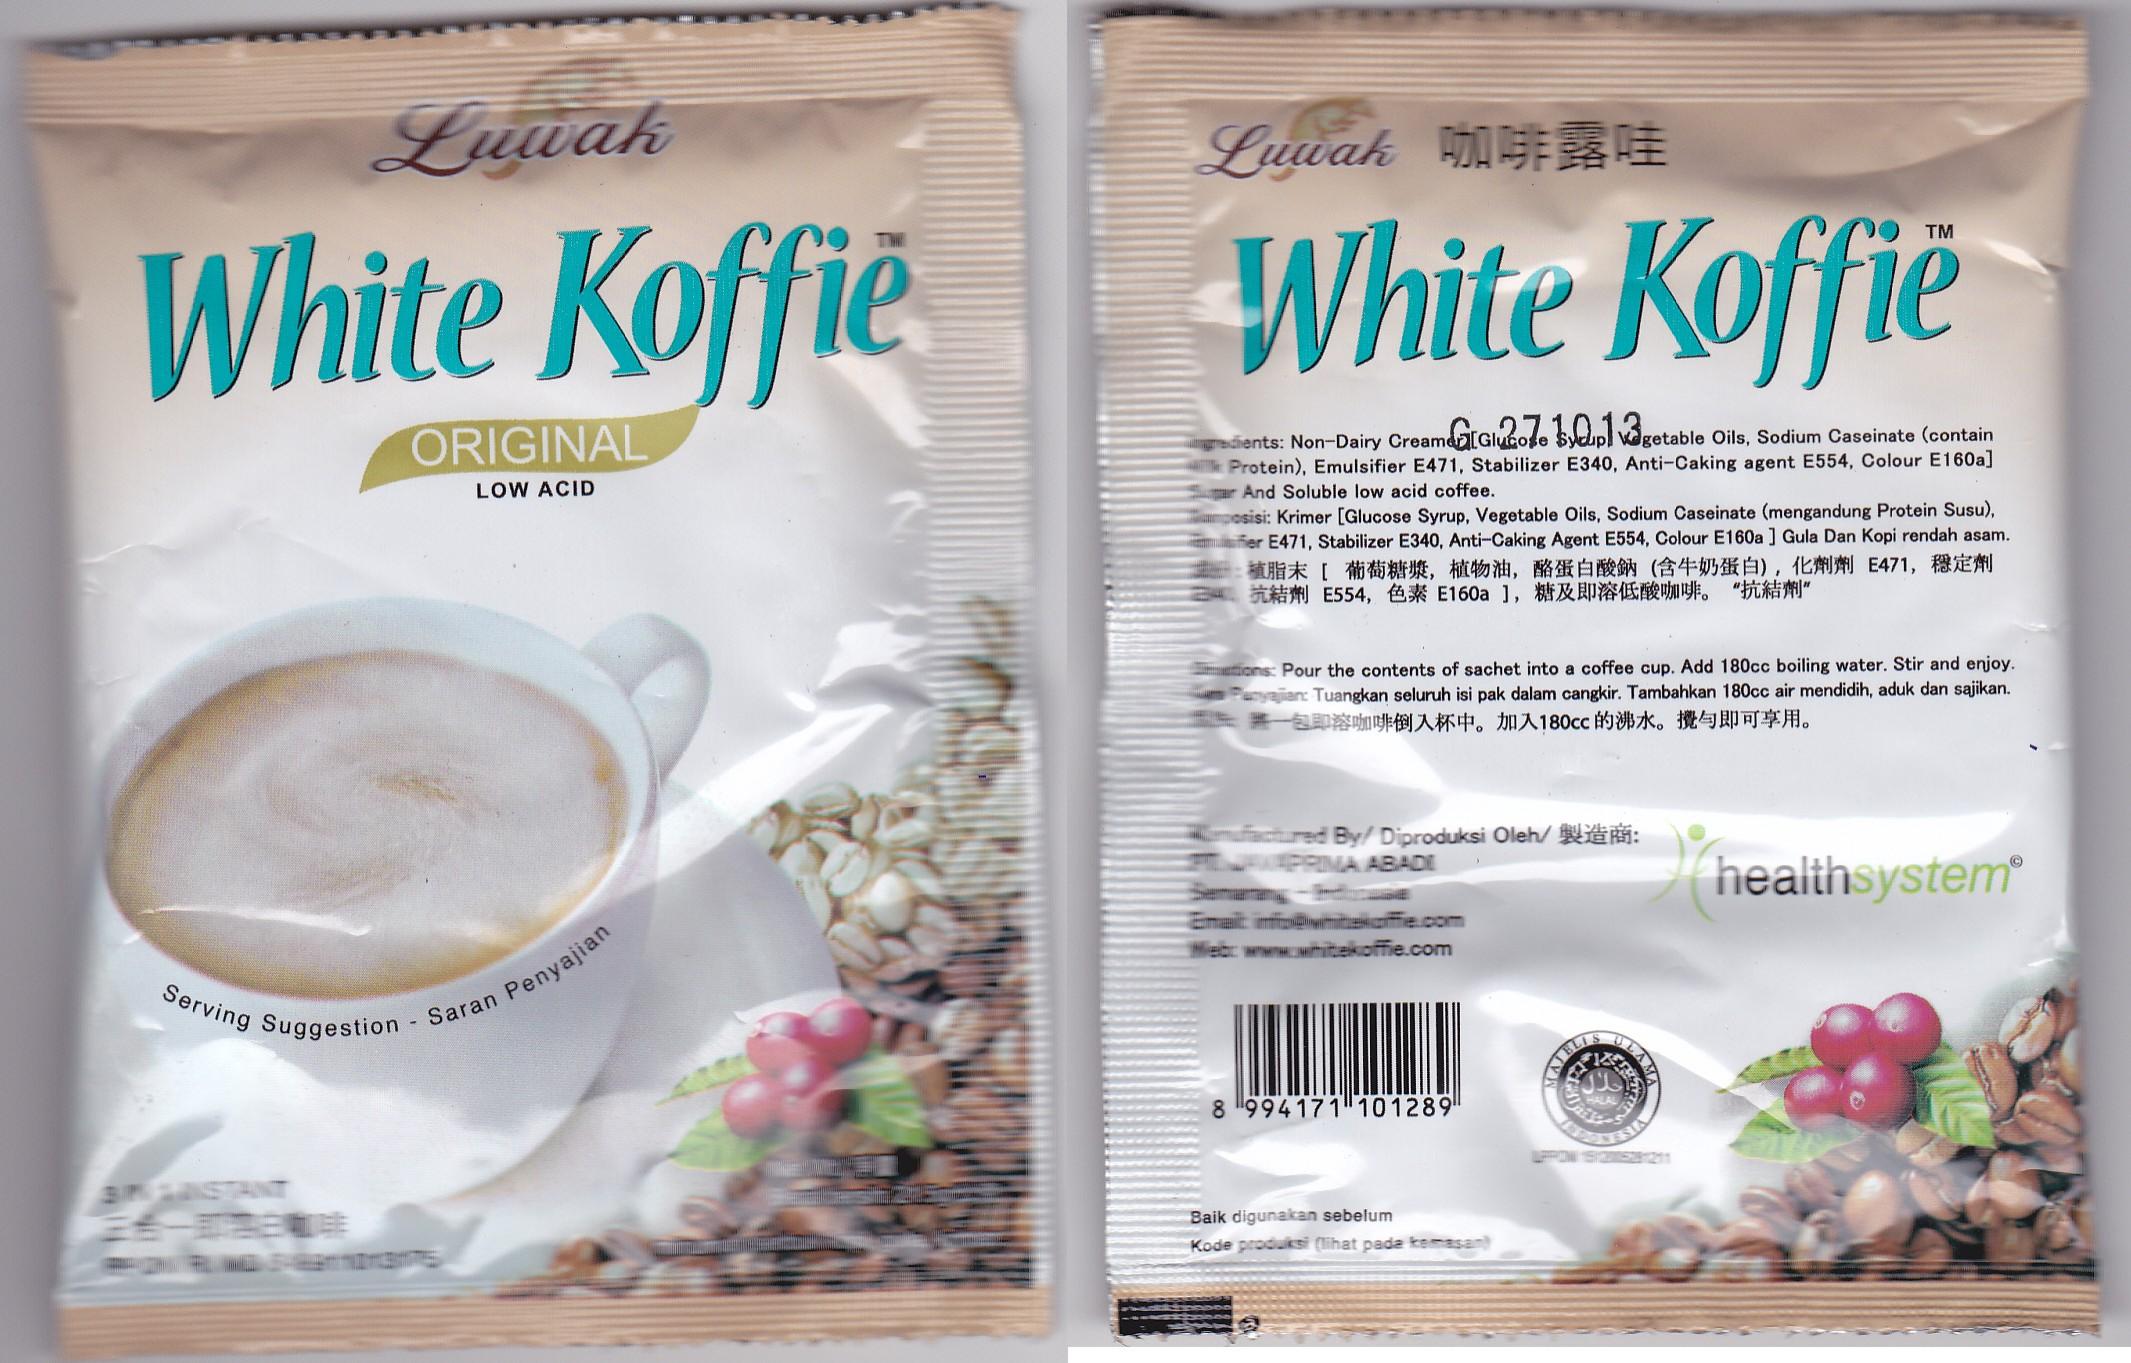 Citaten Koffie Haram : Luwak white koffie halal atau haram pradirwan